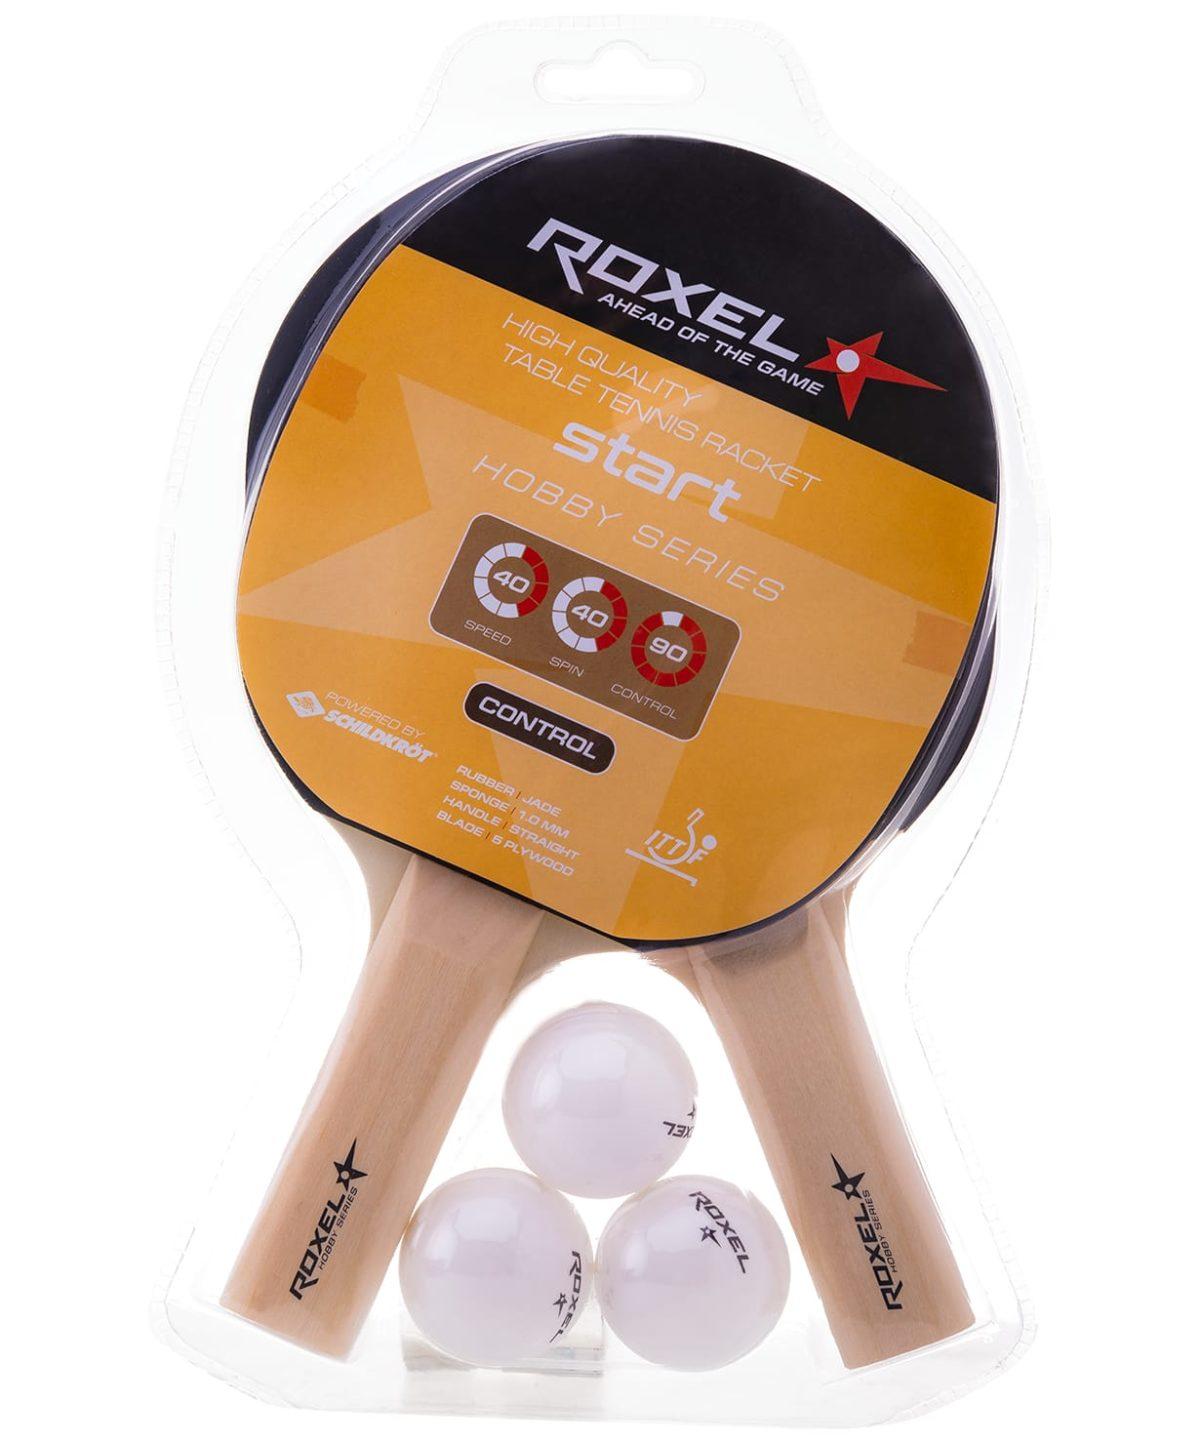 ROXEL Hobby Start Набор для настольного тенниса   15366 - 1